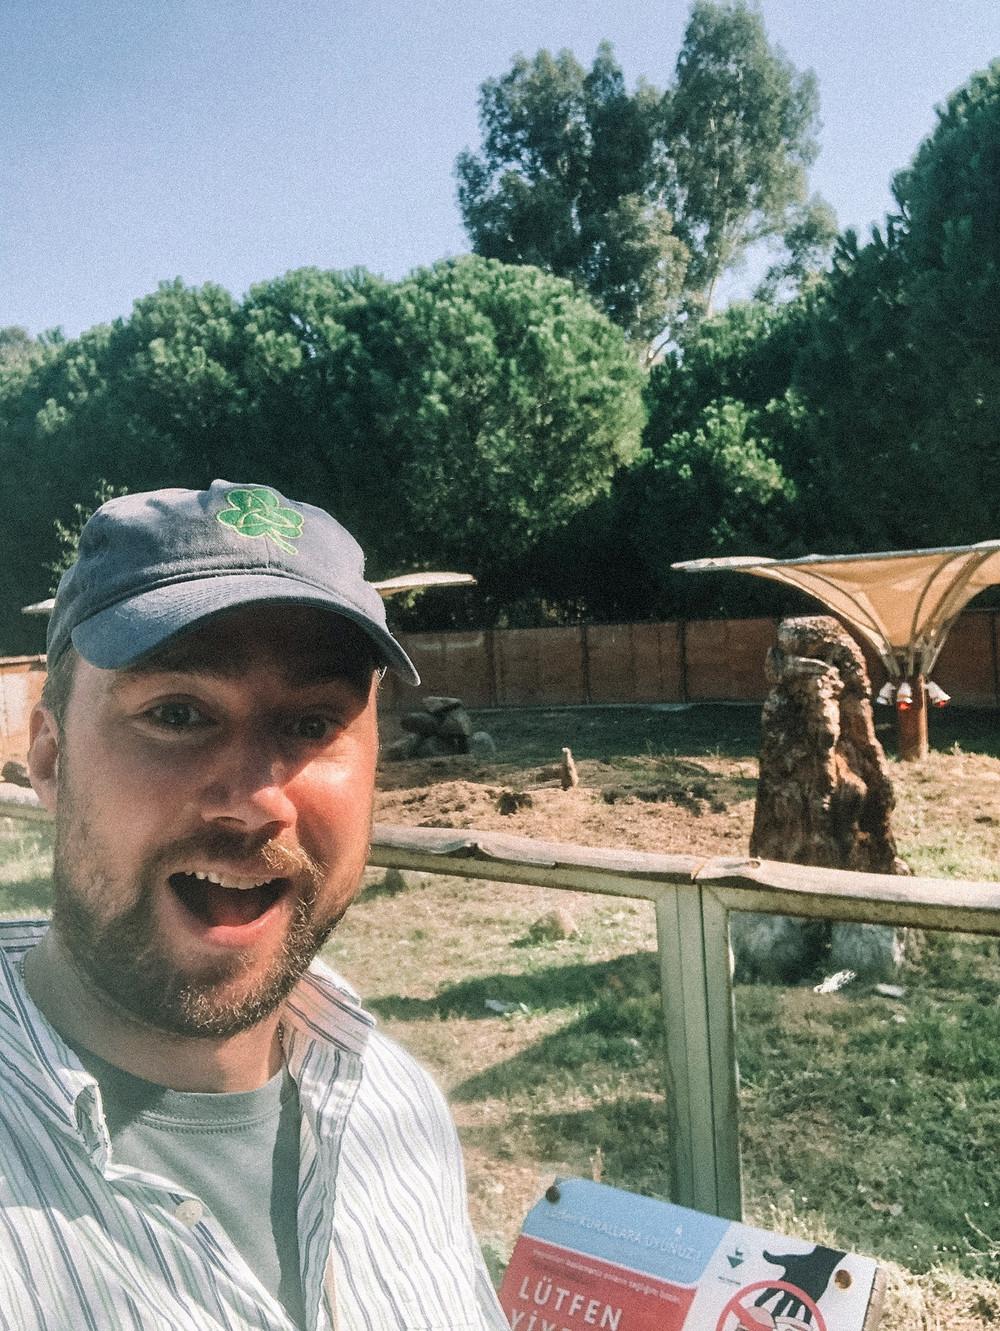 Chipp and his meerkat friends at the Izmir Wildlife Park